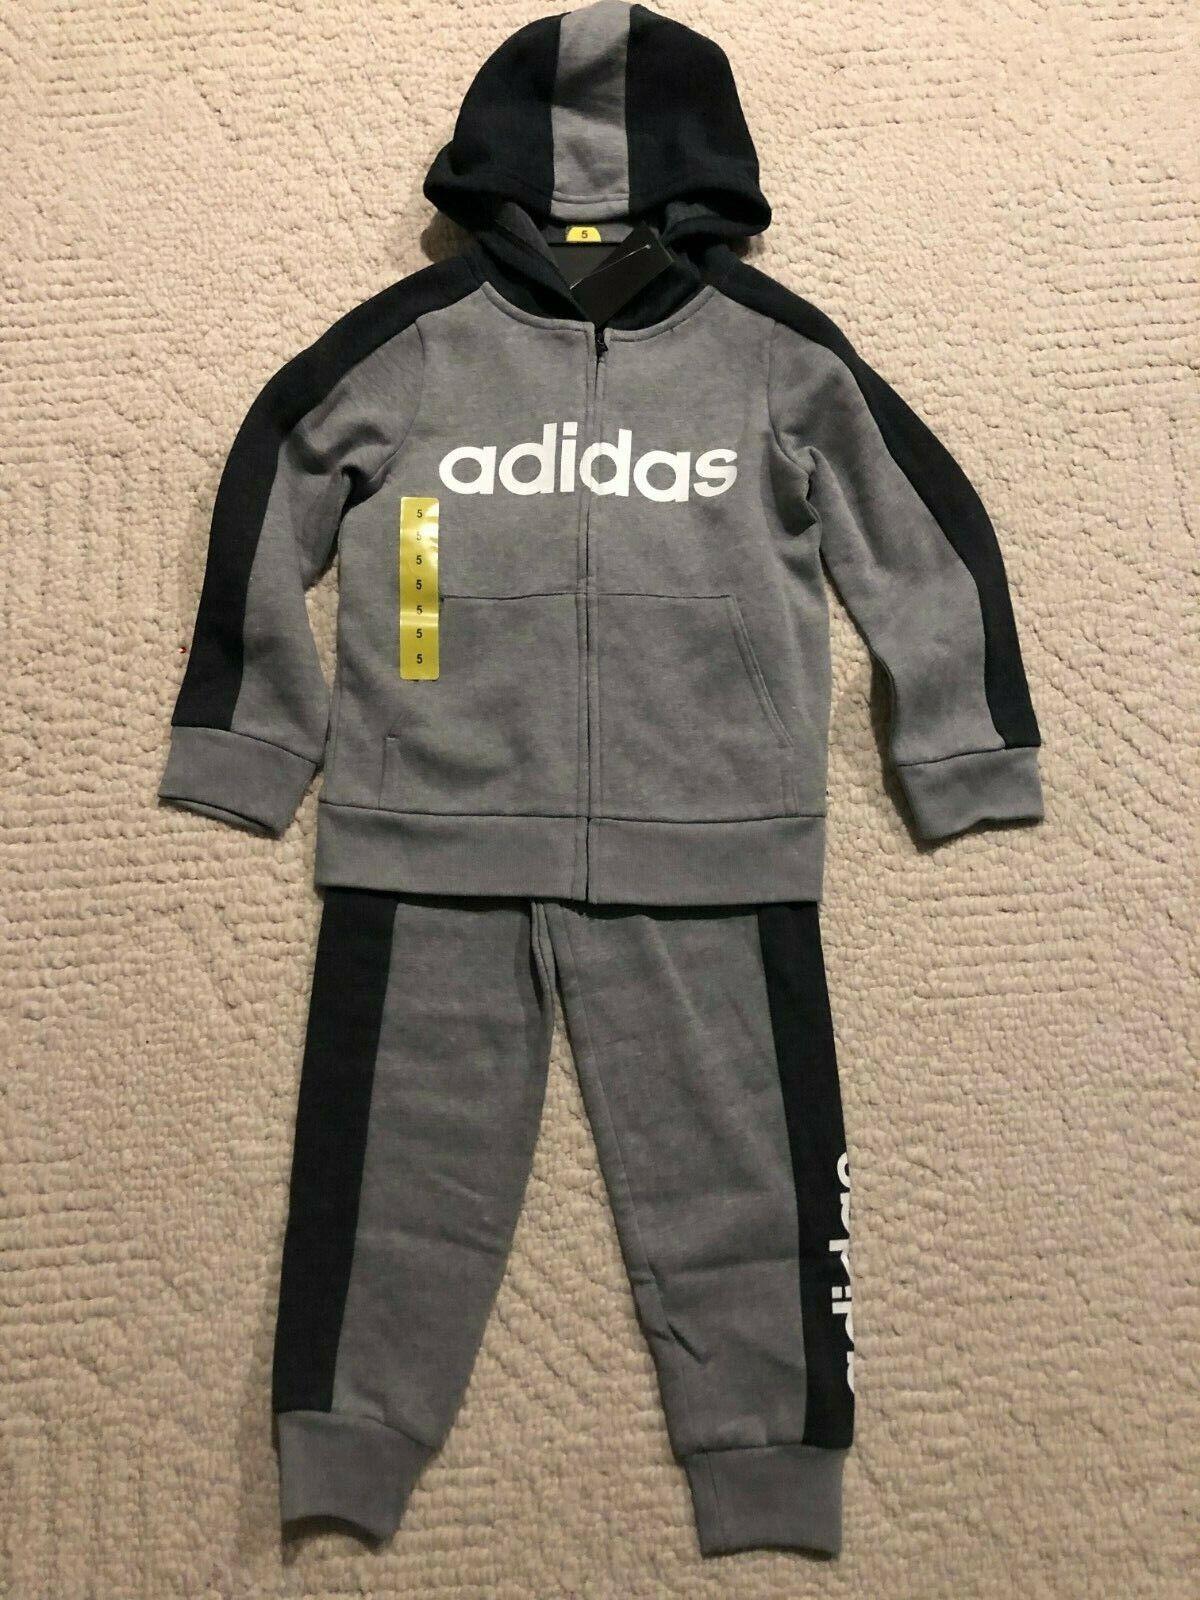 adidas Little Boys Full-Zip Gray Jogger Sweats Track Suit  S